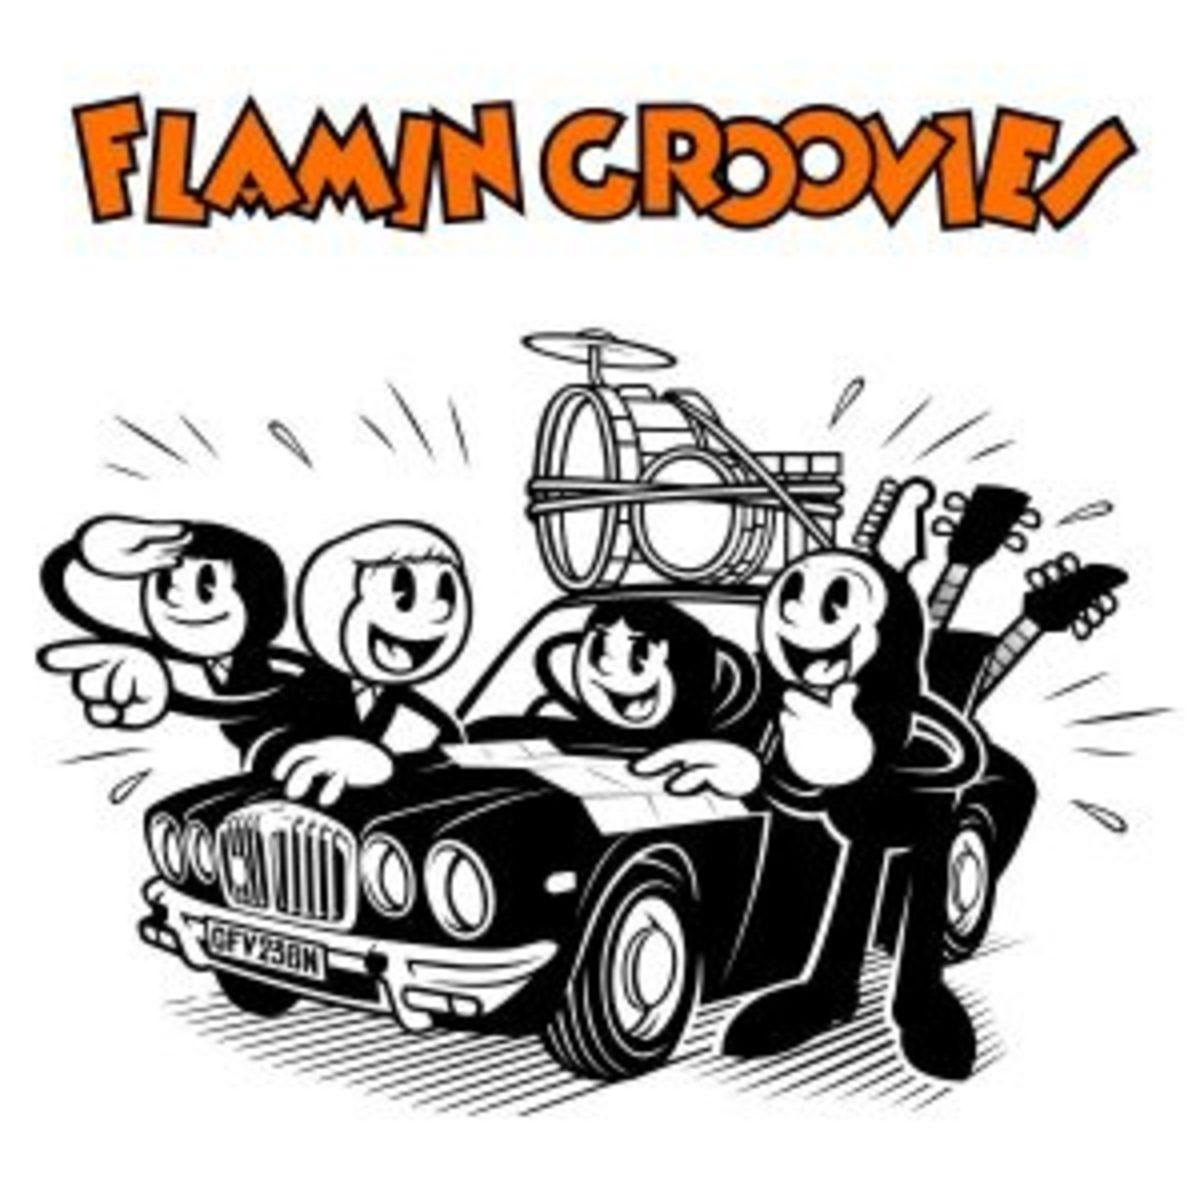 flamin_groovies_-_crazy_macy_sm_2